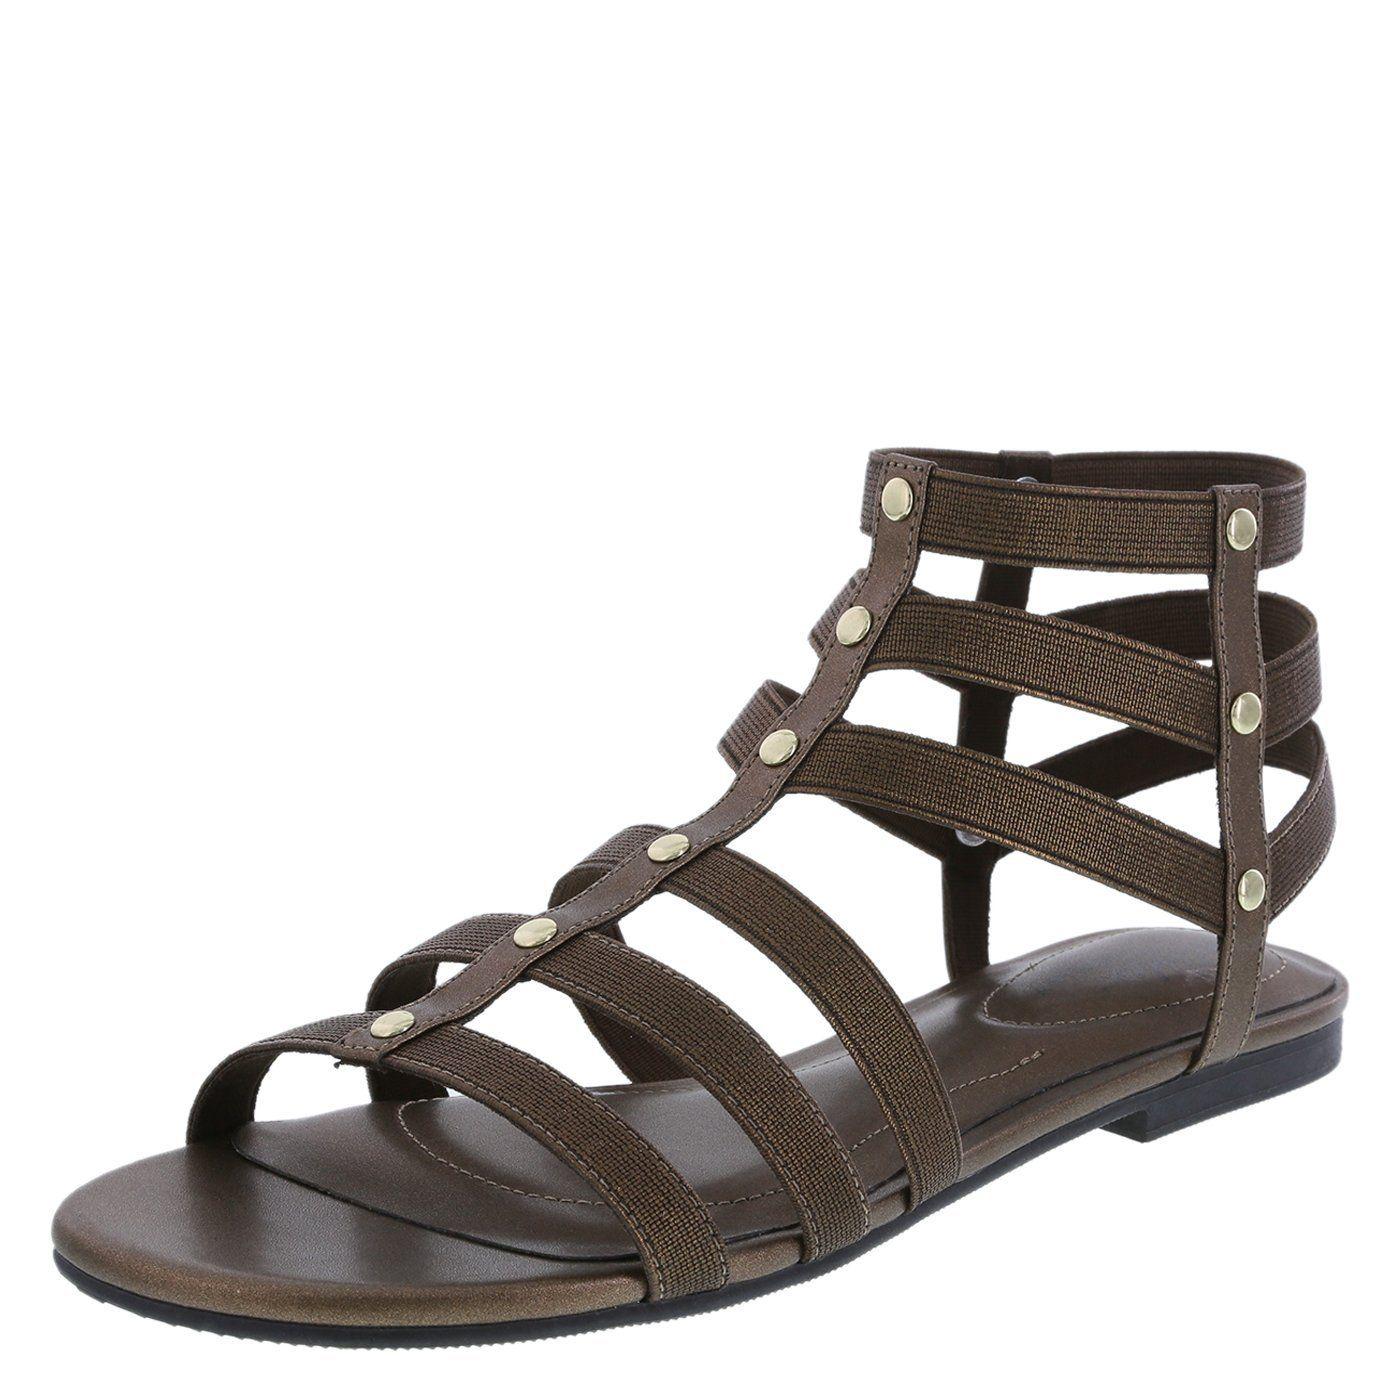 ce8968eae67c3 Amazon.com: dexflex Comfort Women's Troy Stretch Gladiator Flat ...